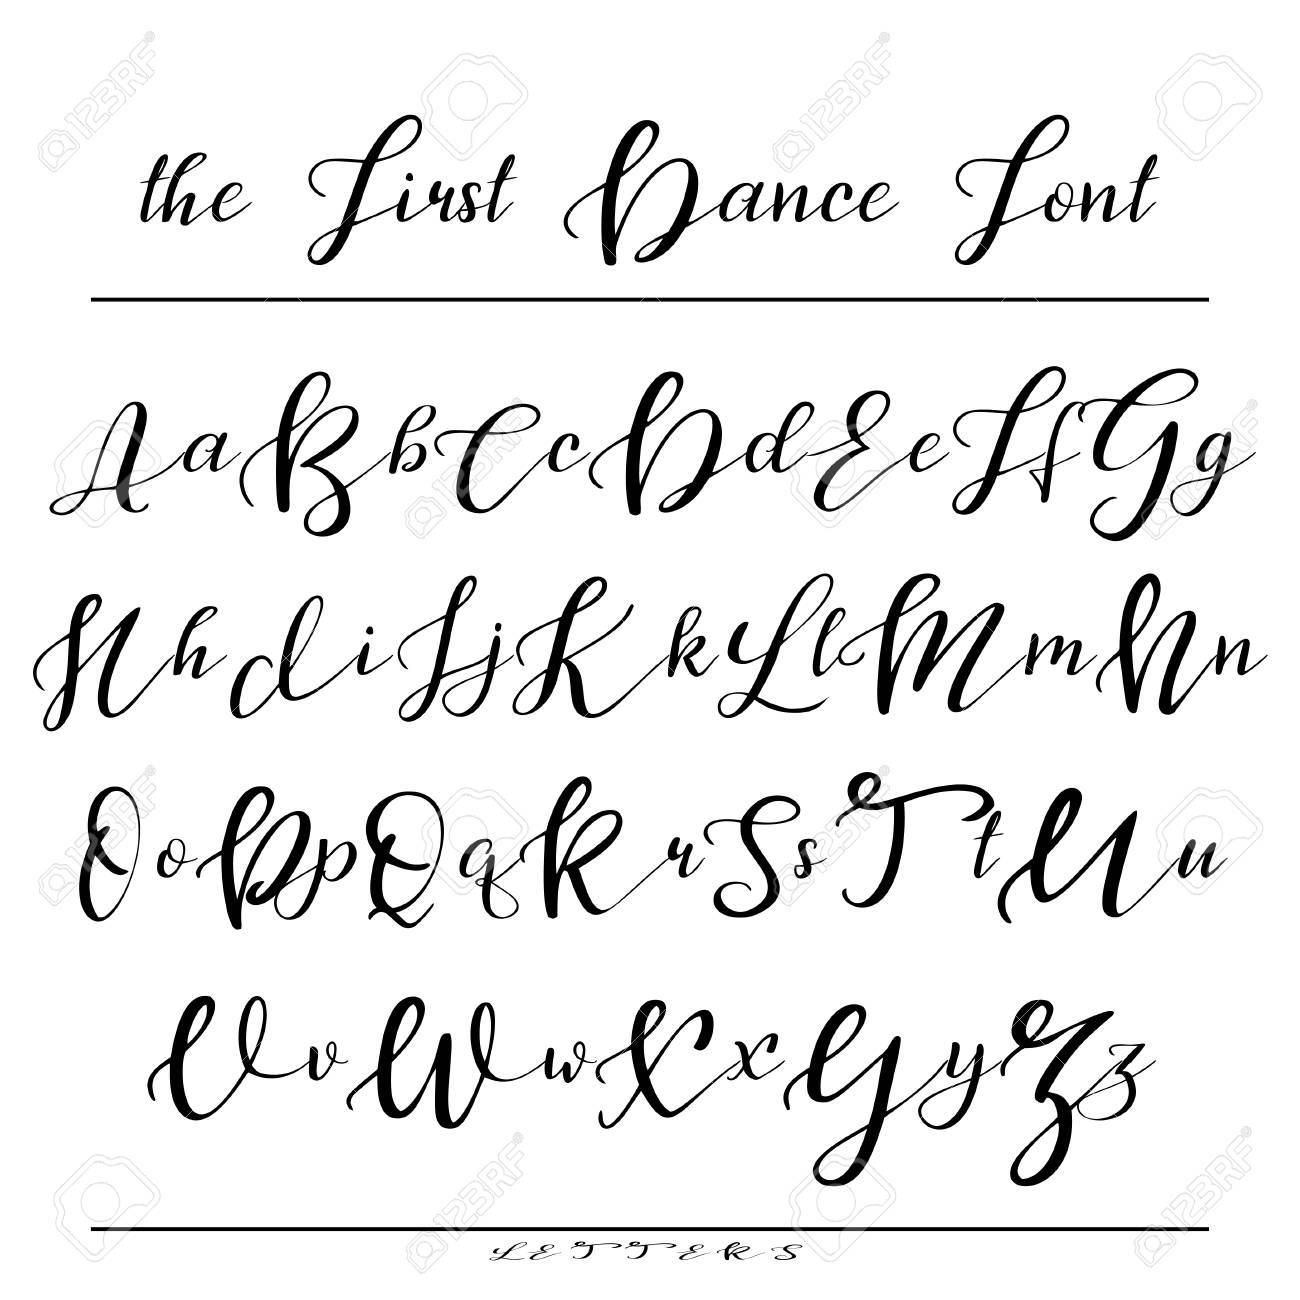 Handwritten Calligraphy Font Vector Alphabet Hand Drawn Letters